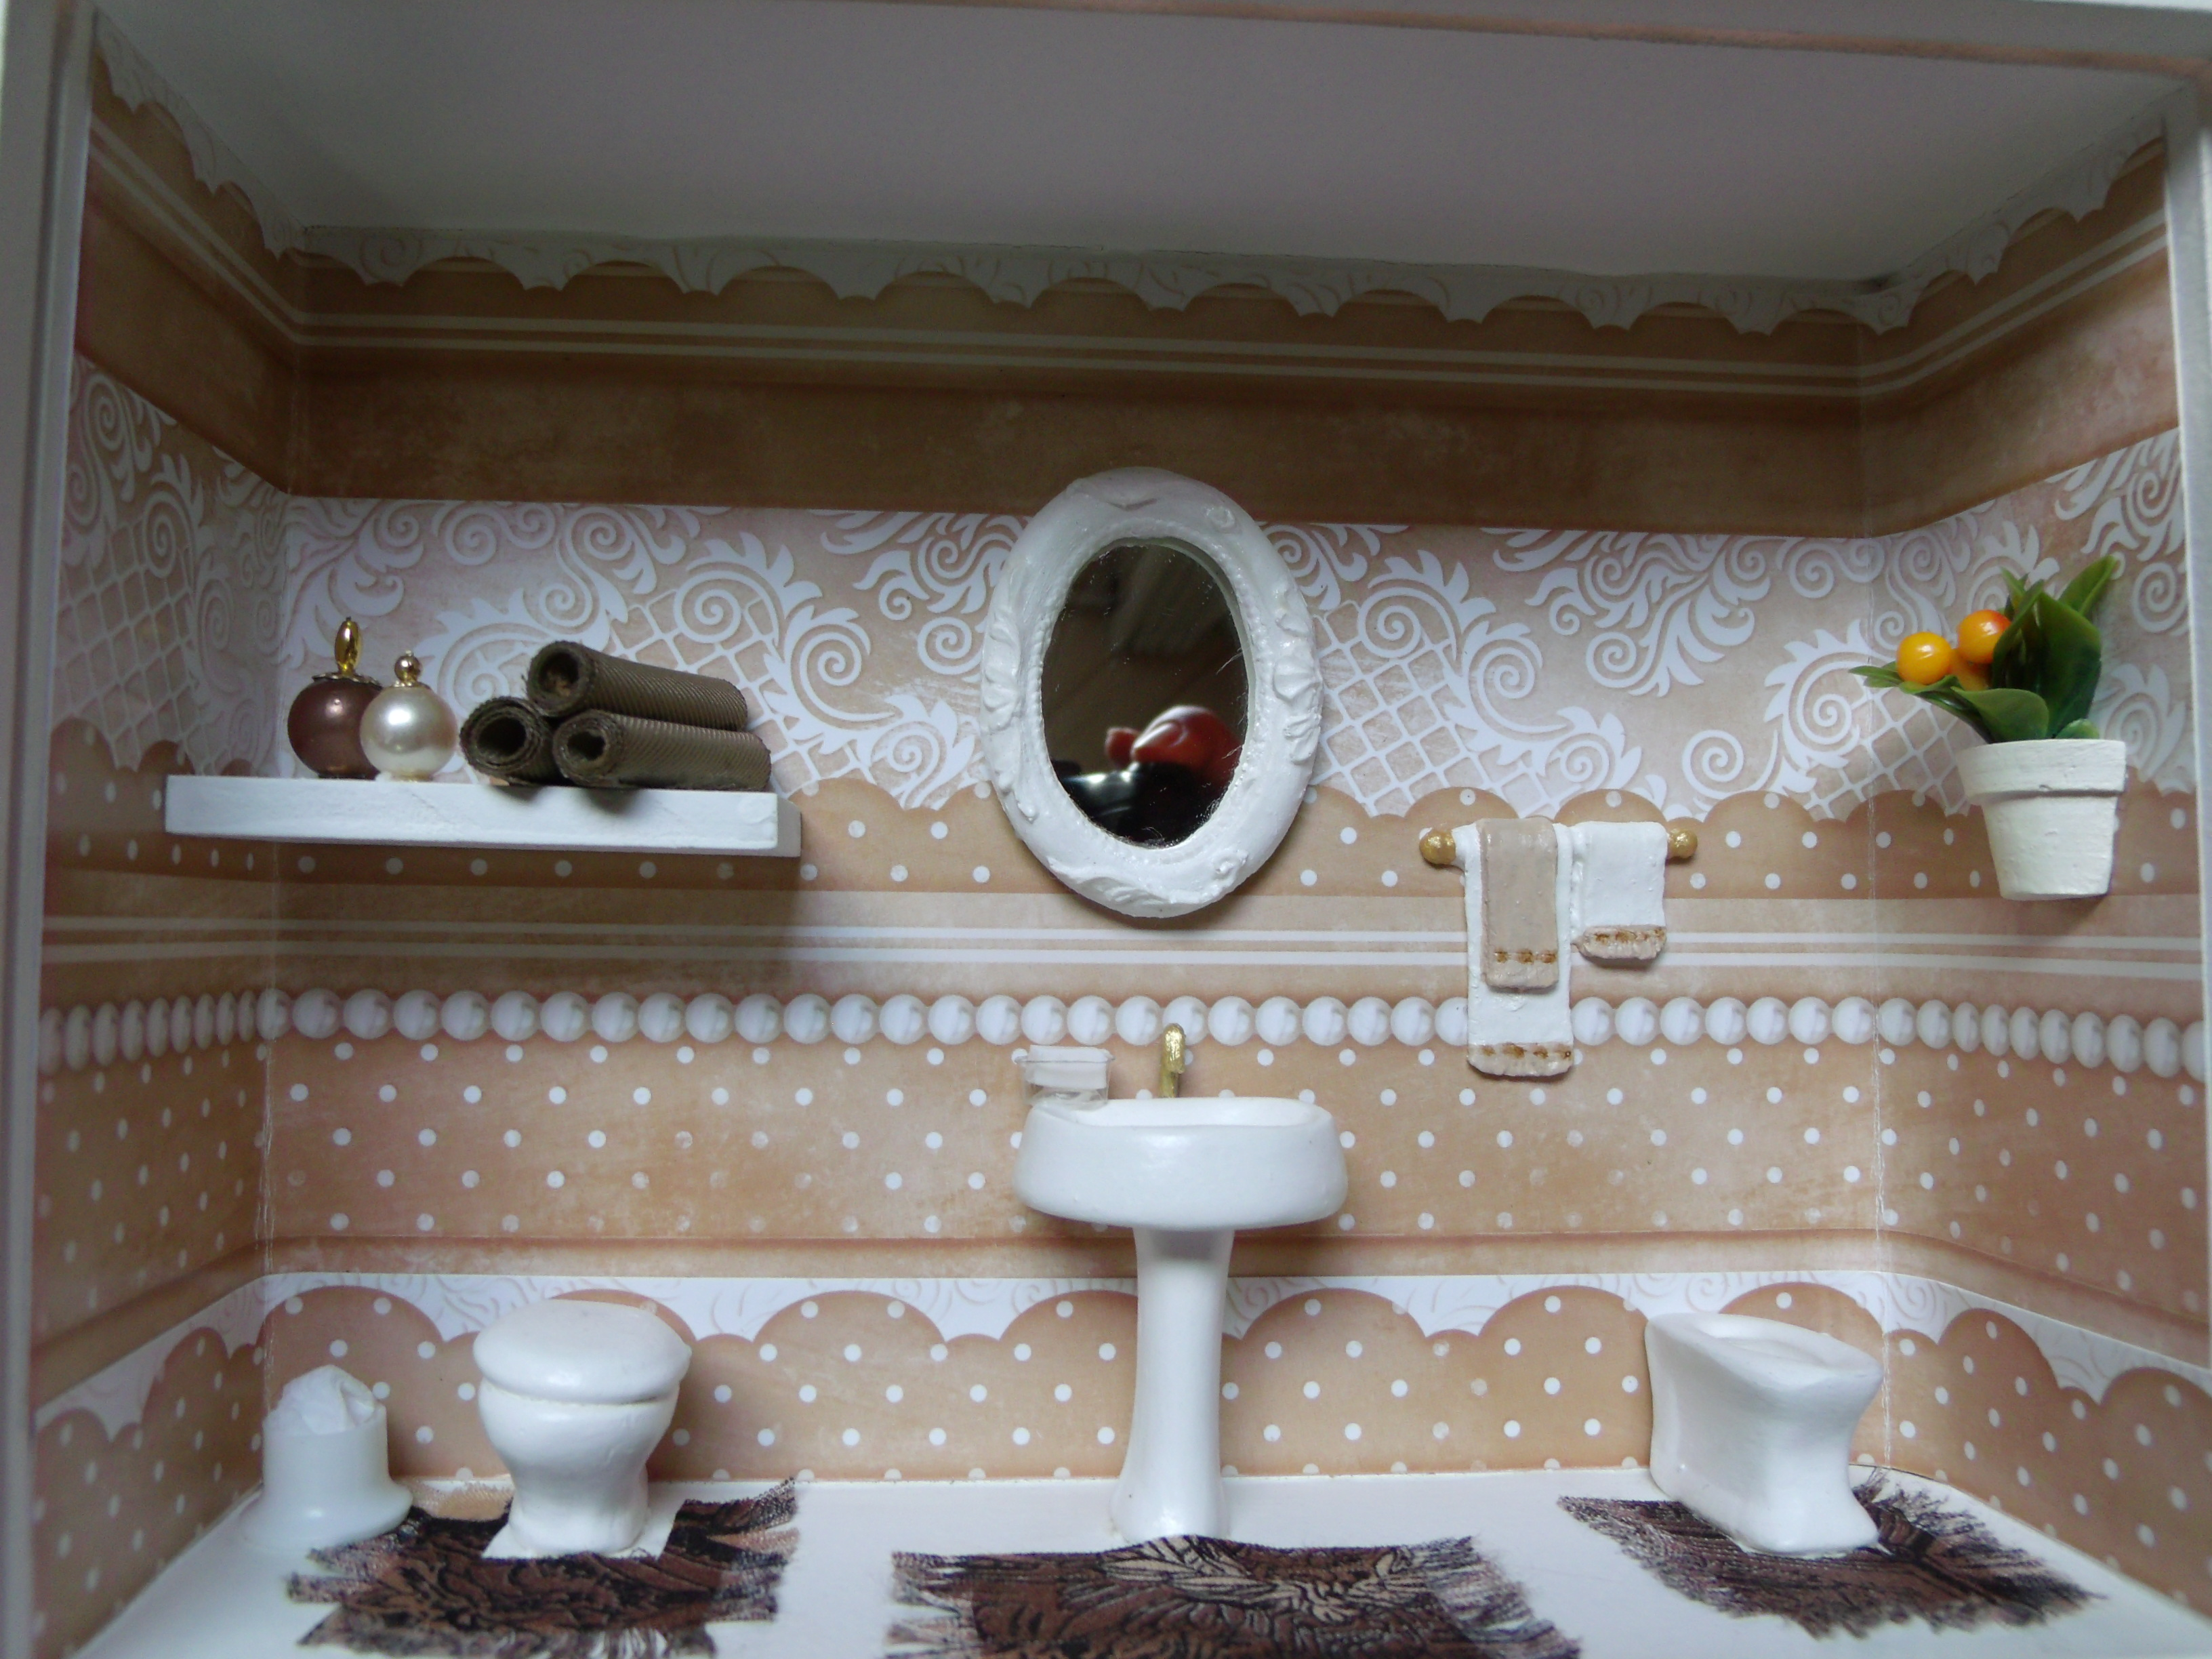 nicho de banheiro n 7 cenario para banheiro nicho de banheiro n 7 mdf #3F3428 3264x2448 Banheiro Com Nicho Como Fazer